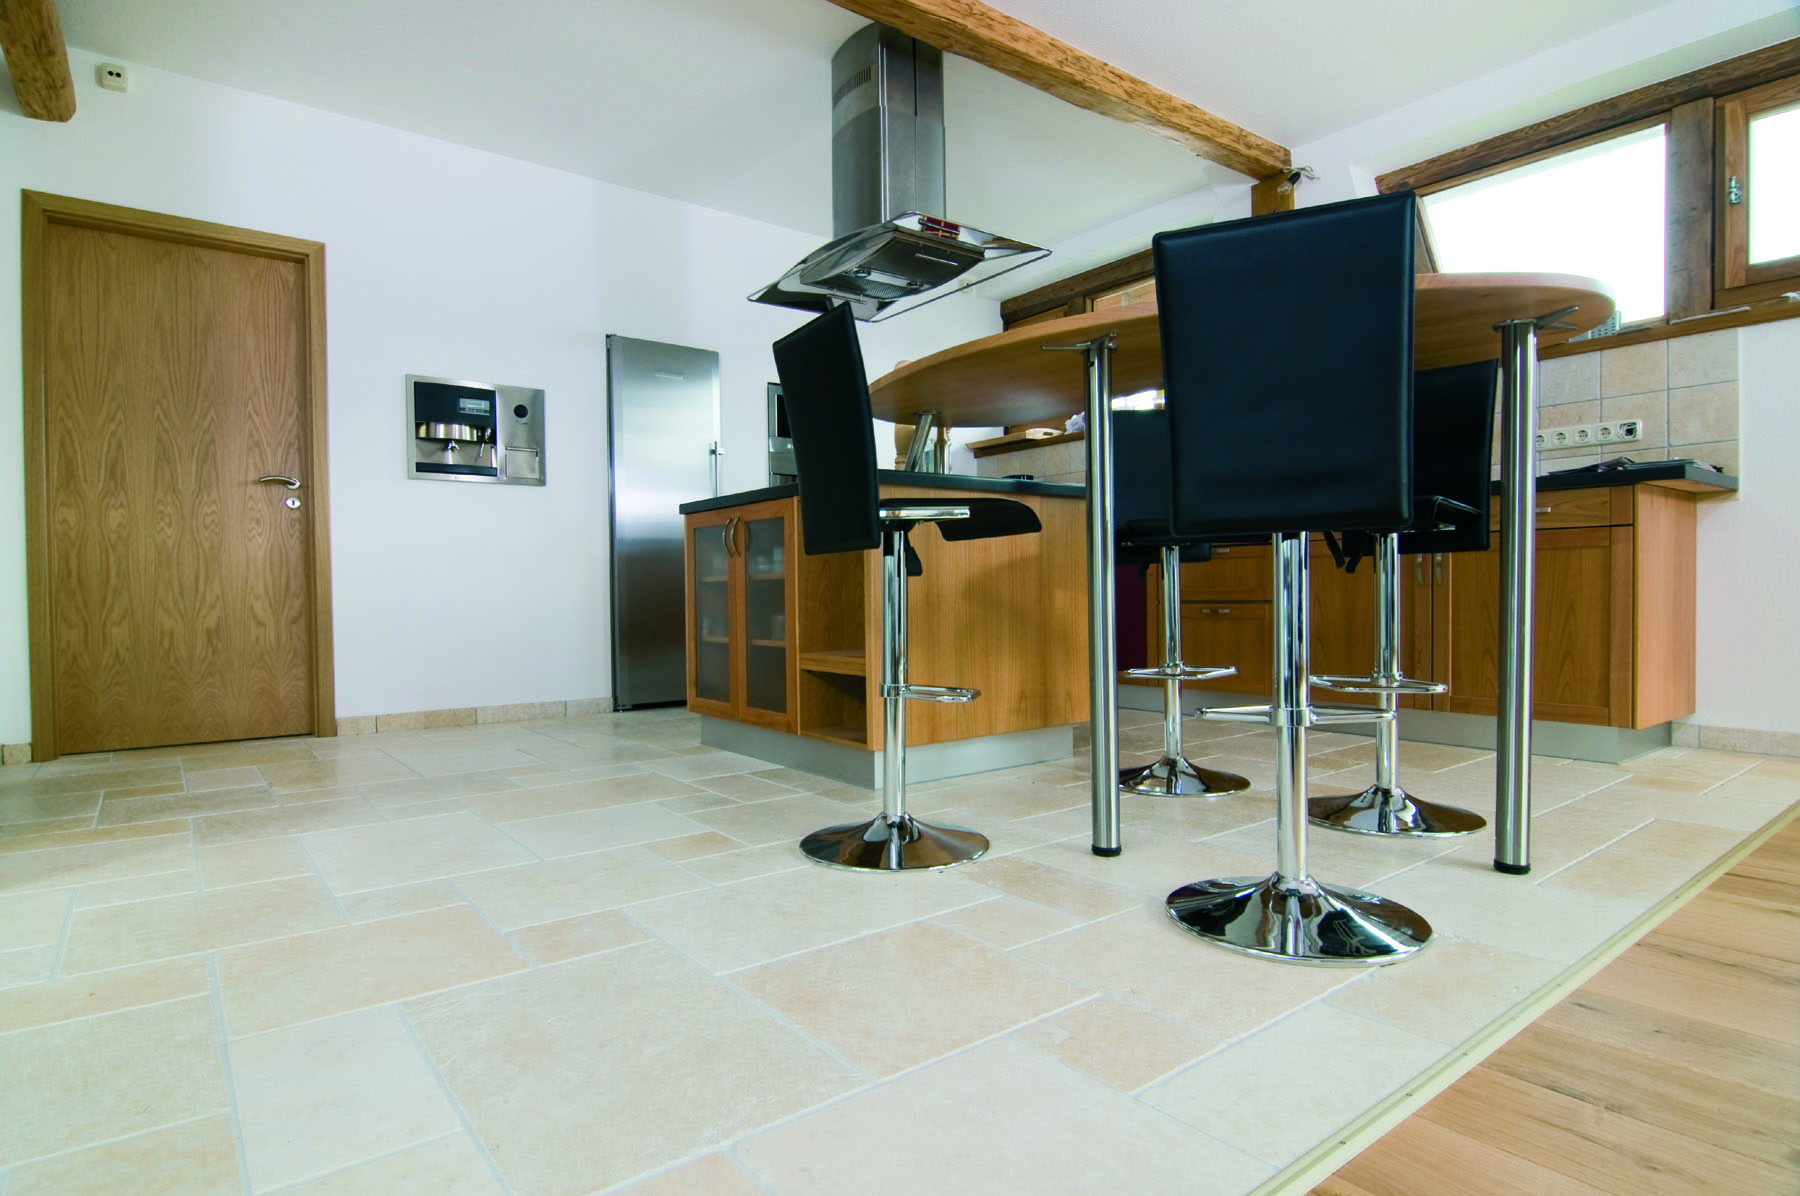 crema marfil backes. Black Bedroom Furniture Sets. Home Design Ideas